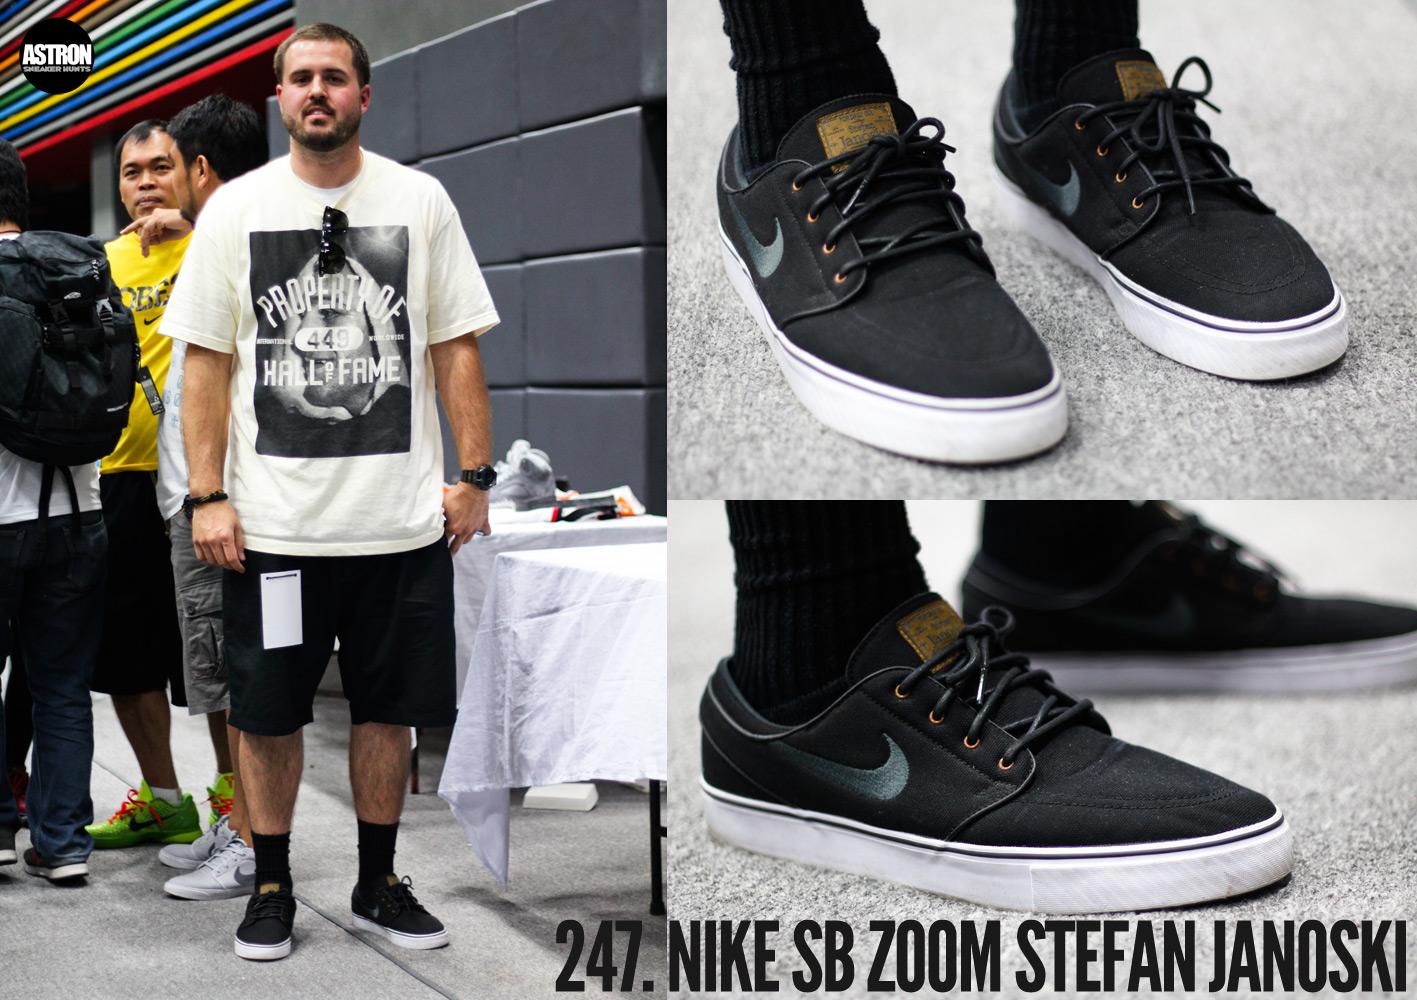 Ananiver Moderador Ajustamiento  Astron Sneaker Hunts: 247. Nike SB Zoom Stefan Janoski